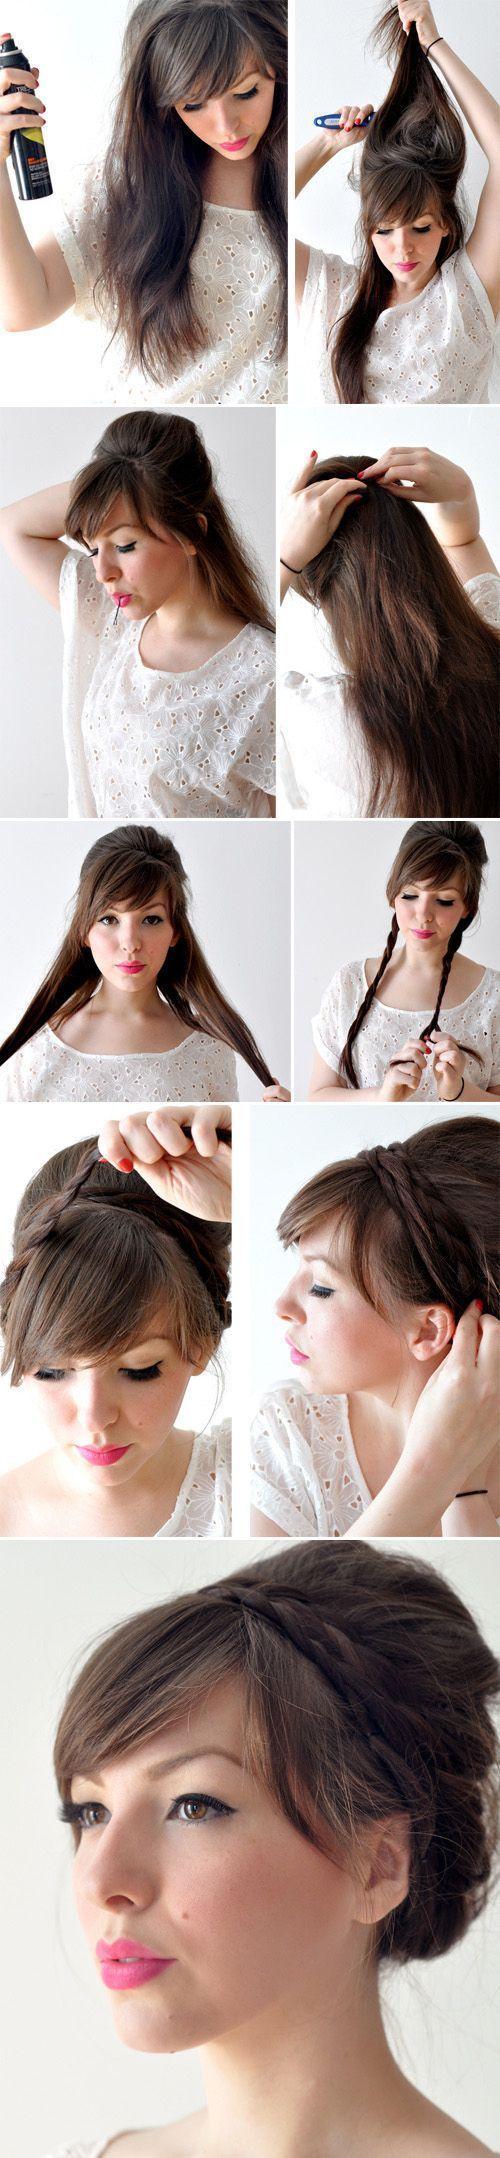 best cabelos images on pinterest